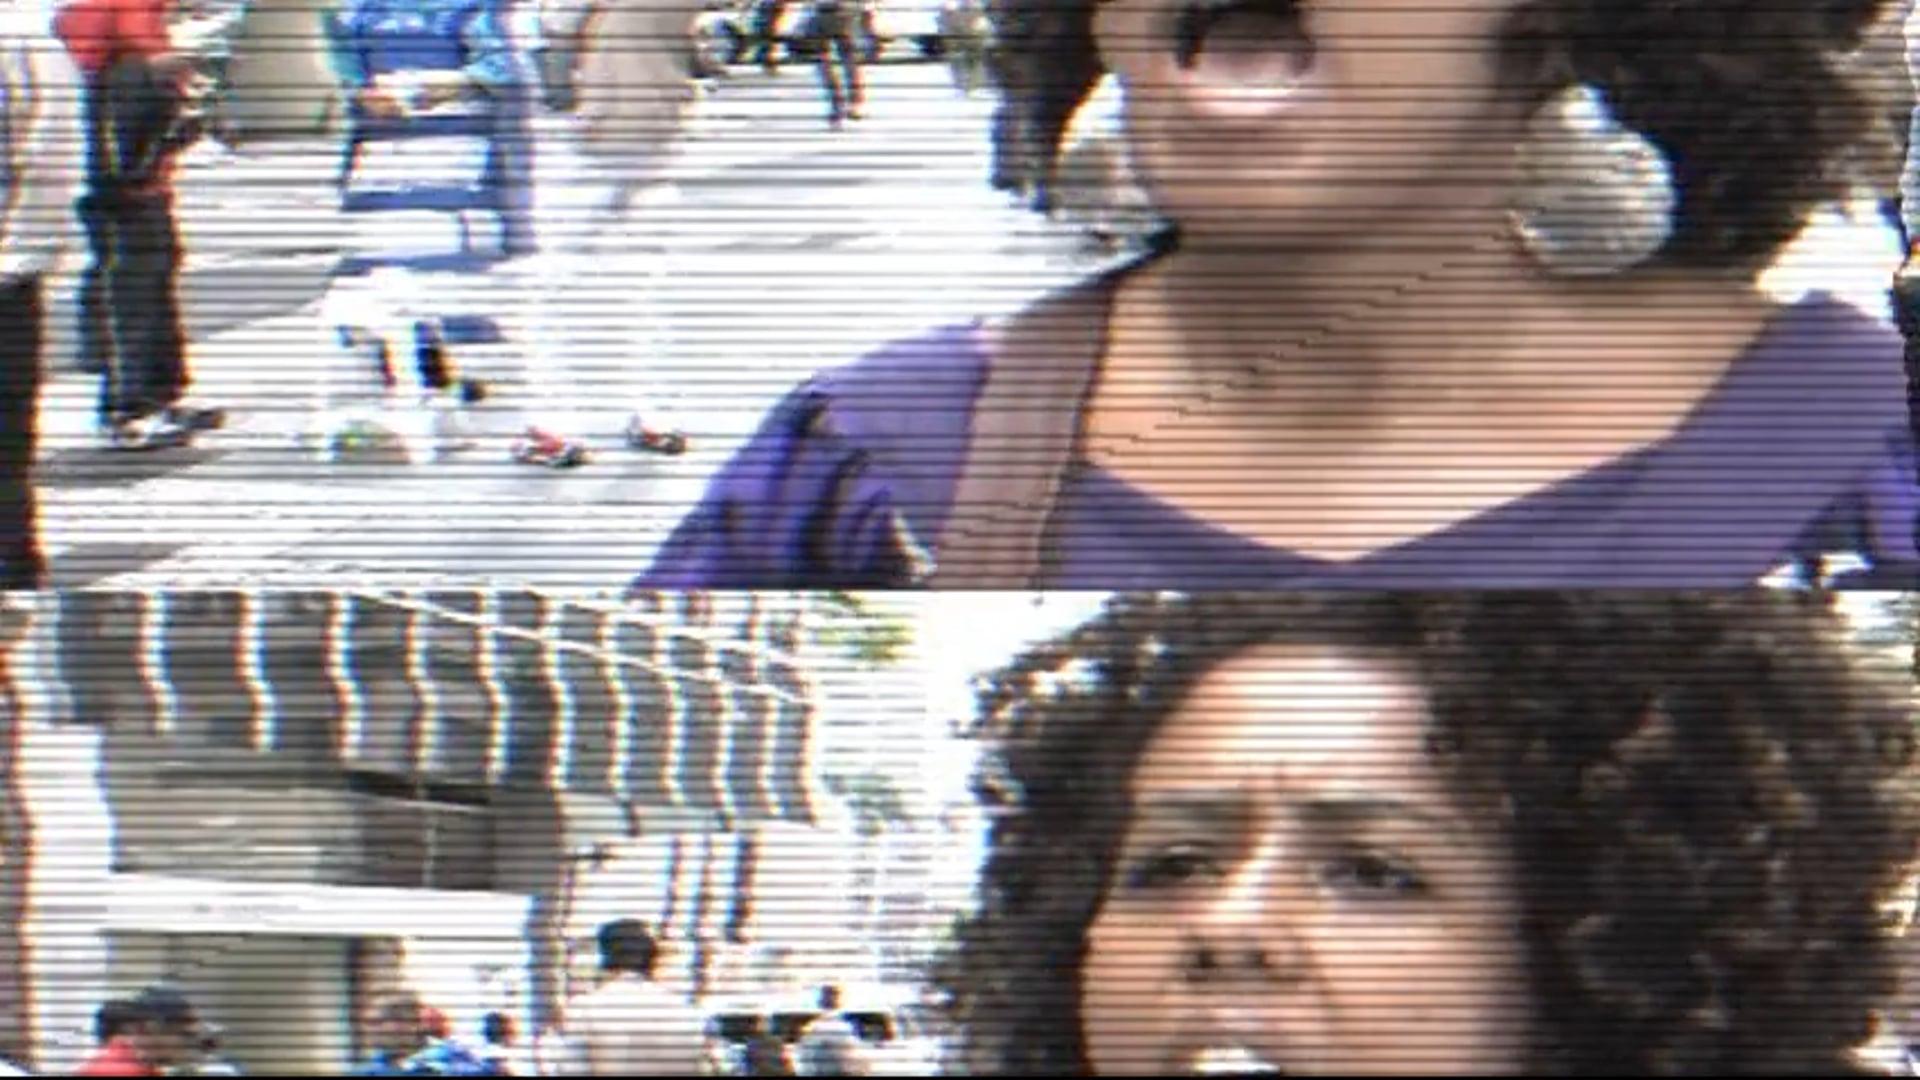 Pulando o Muro (2009)